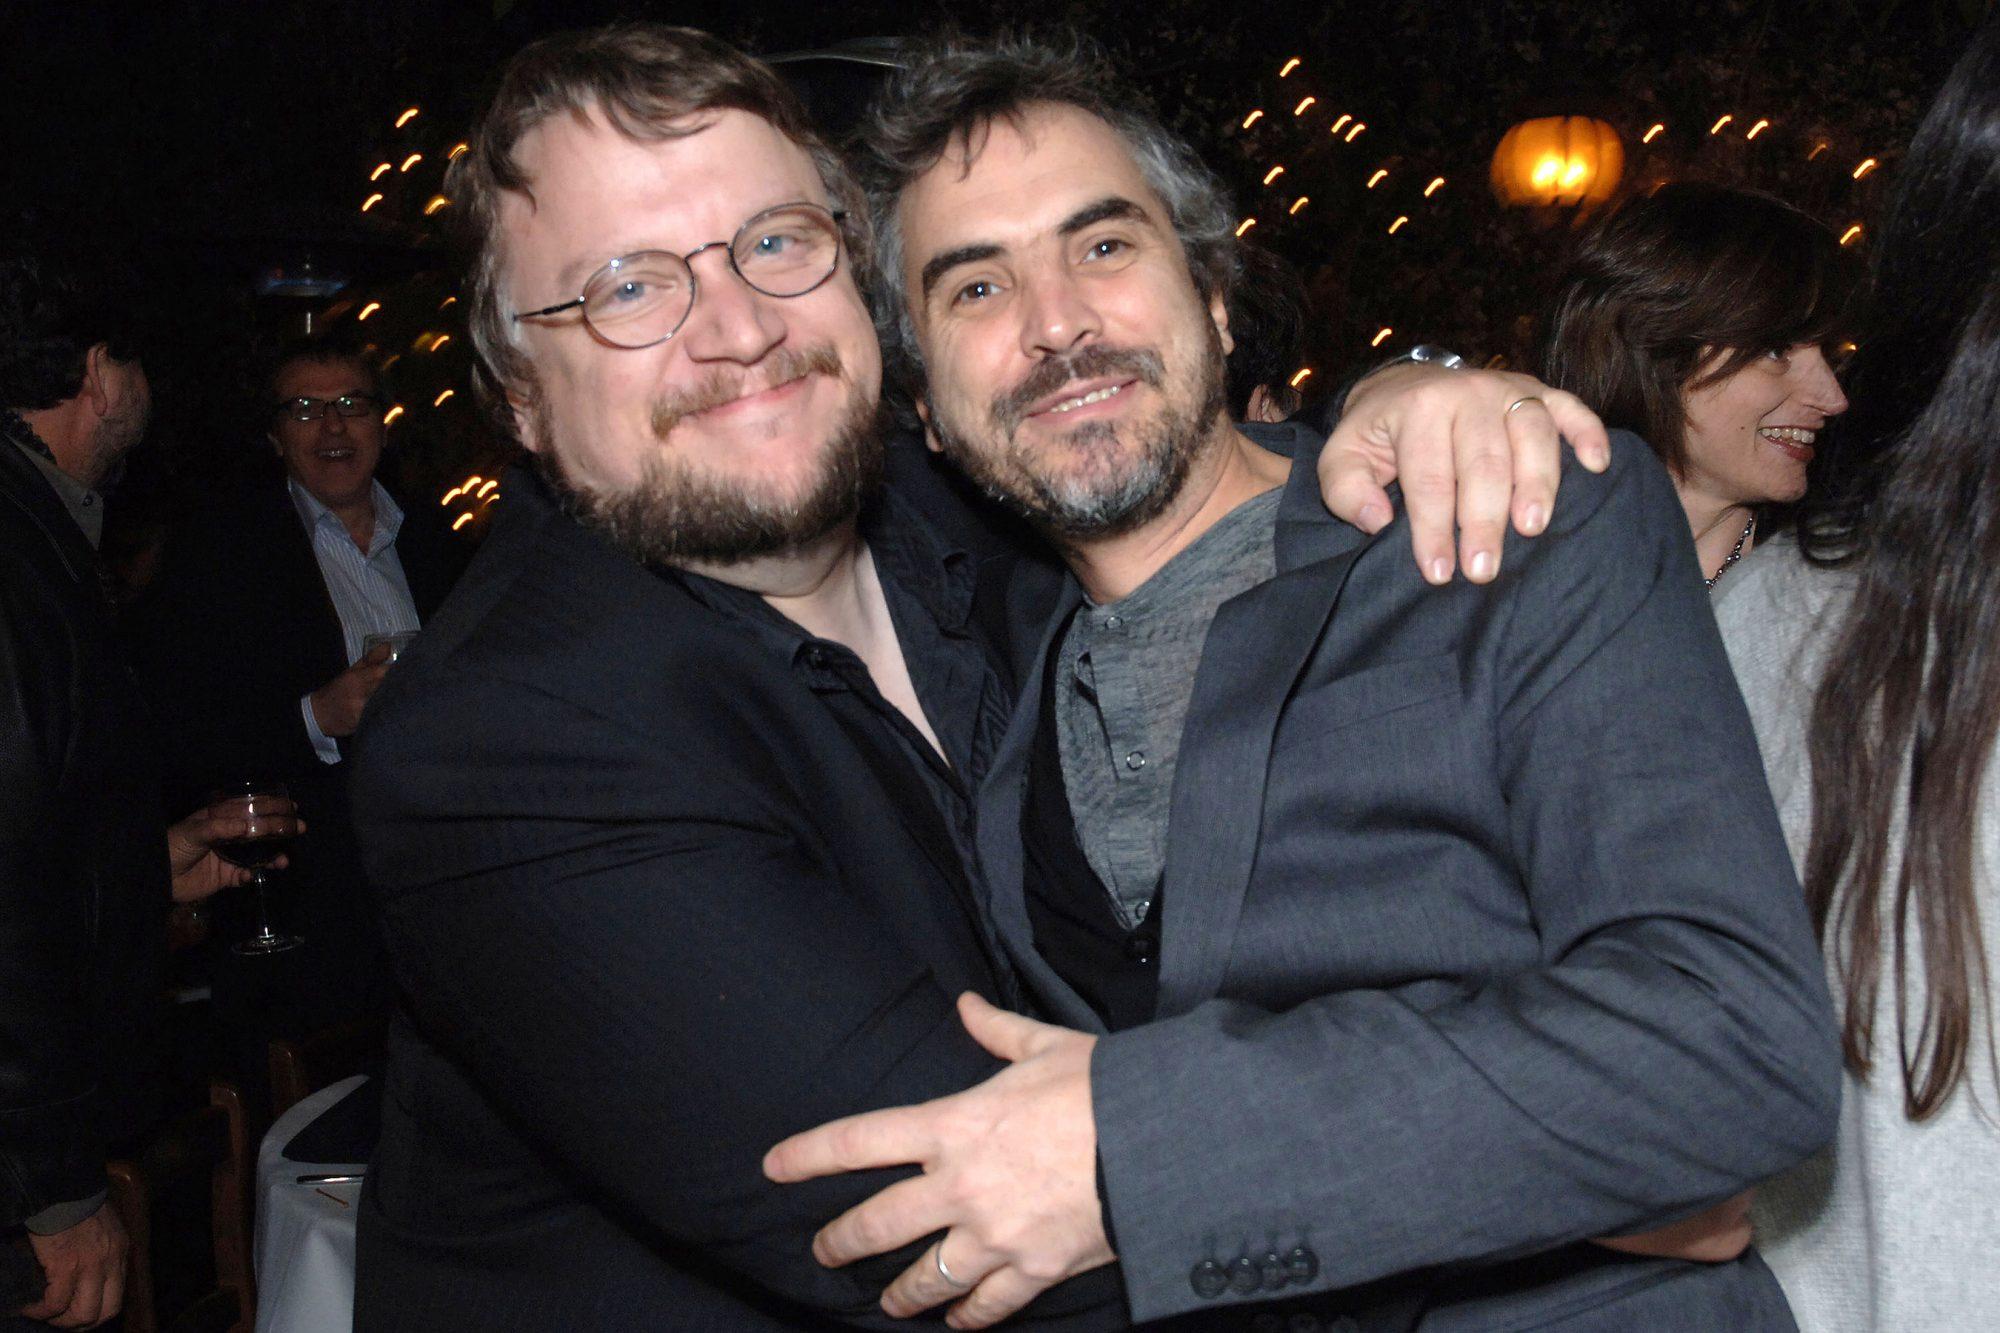 Dinner for Guillermo Del Toro